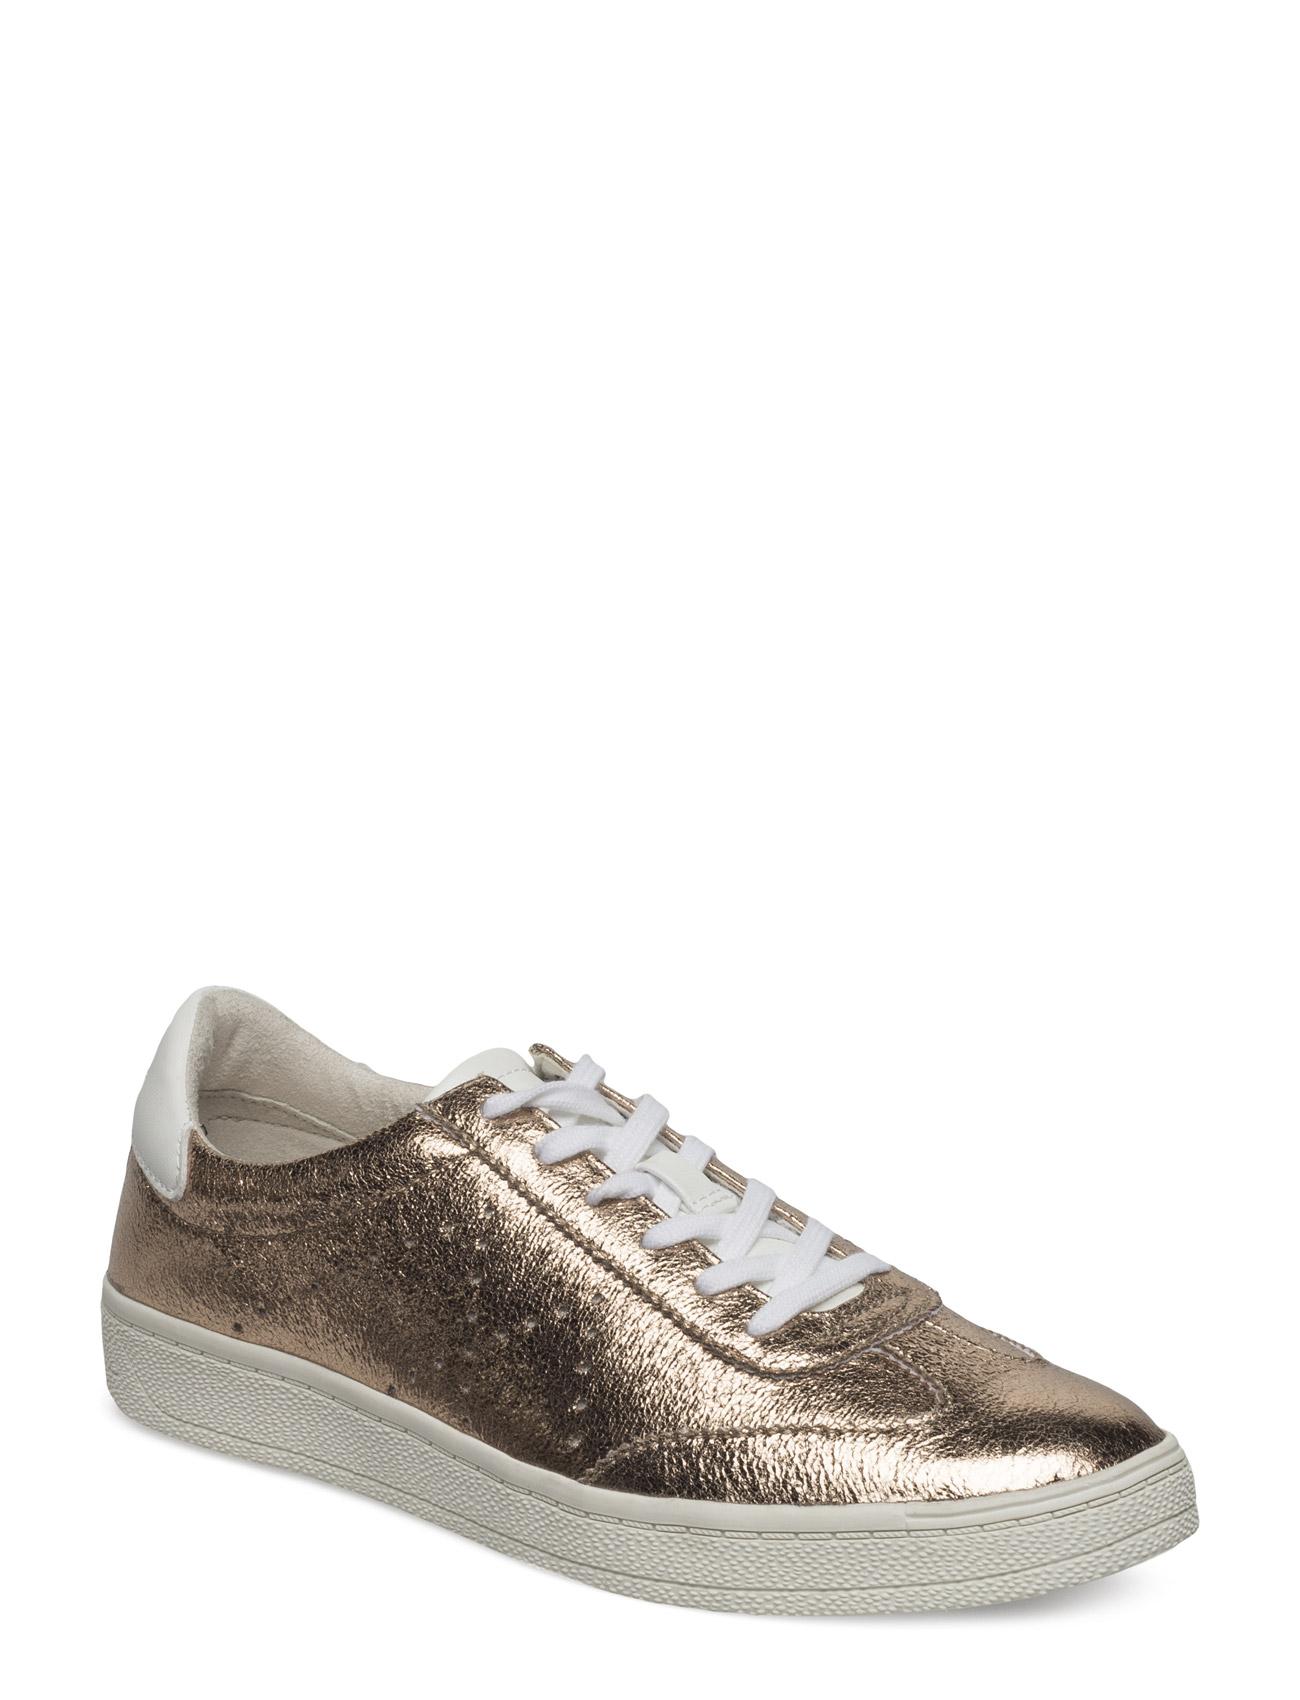 Woms Lace-Up - Marras Tamaris Sneakers til Damer i